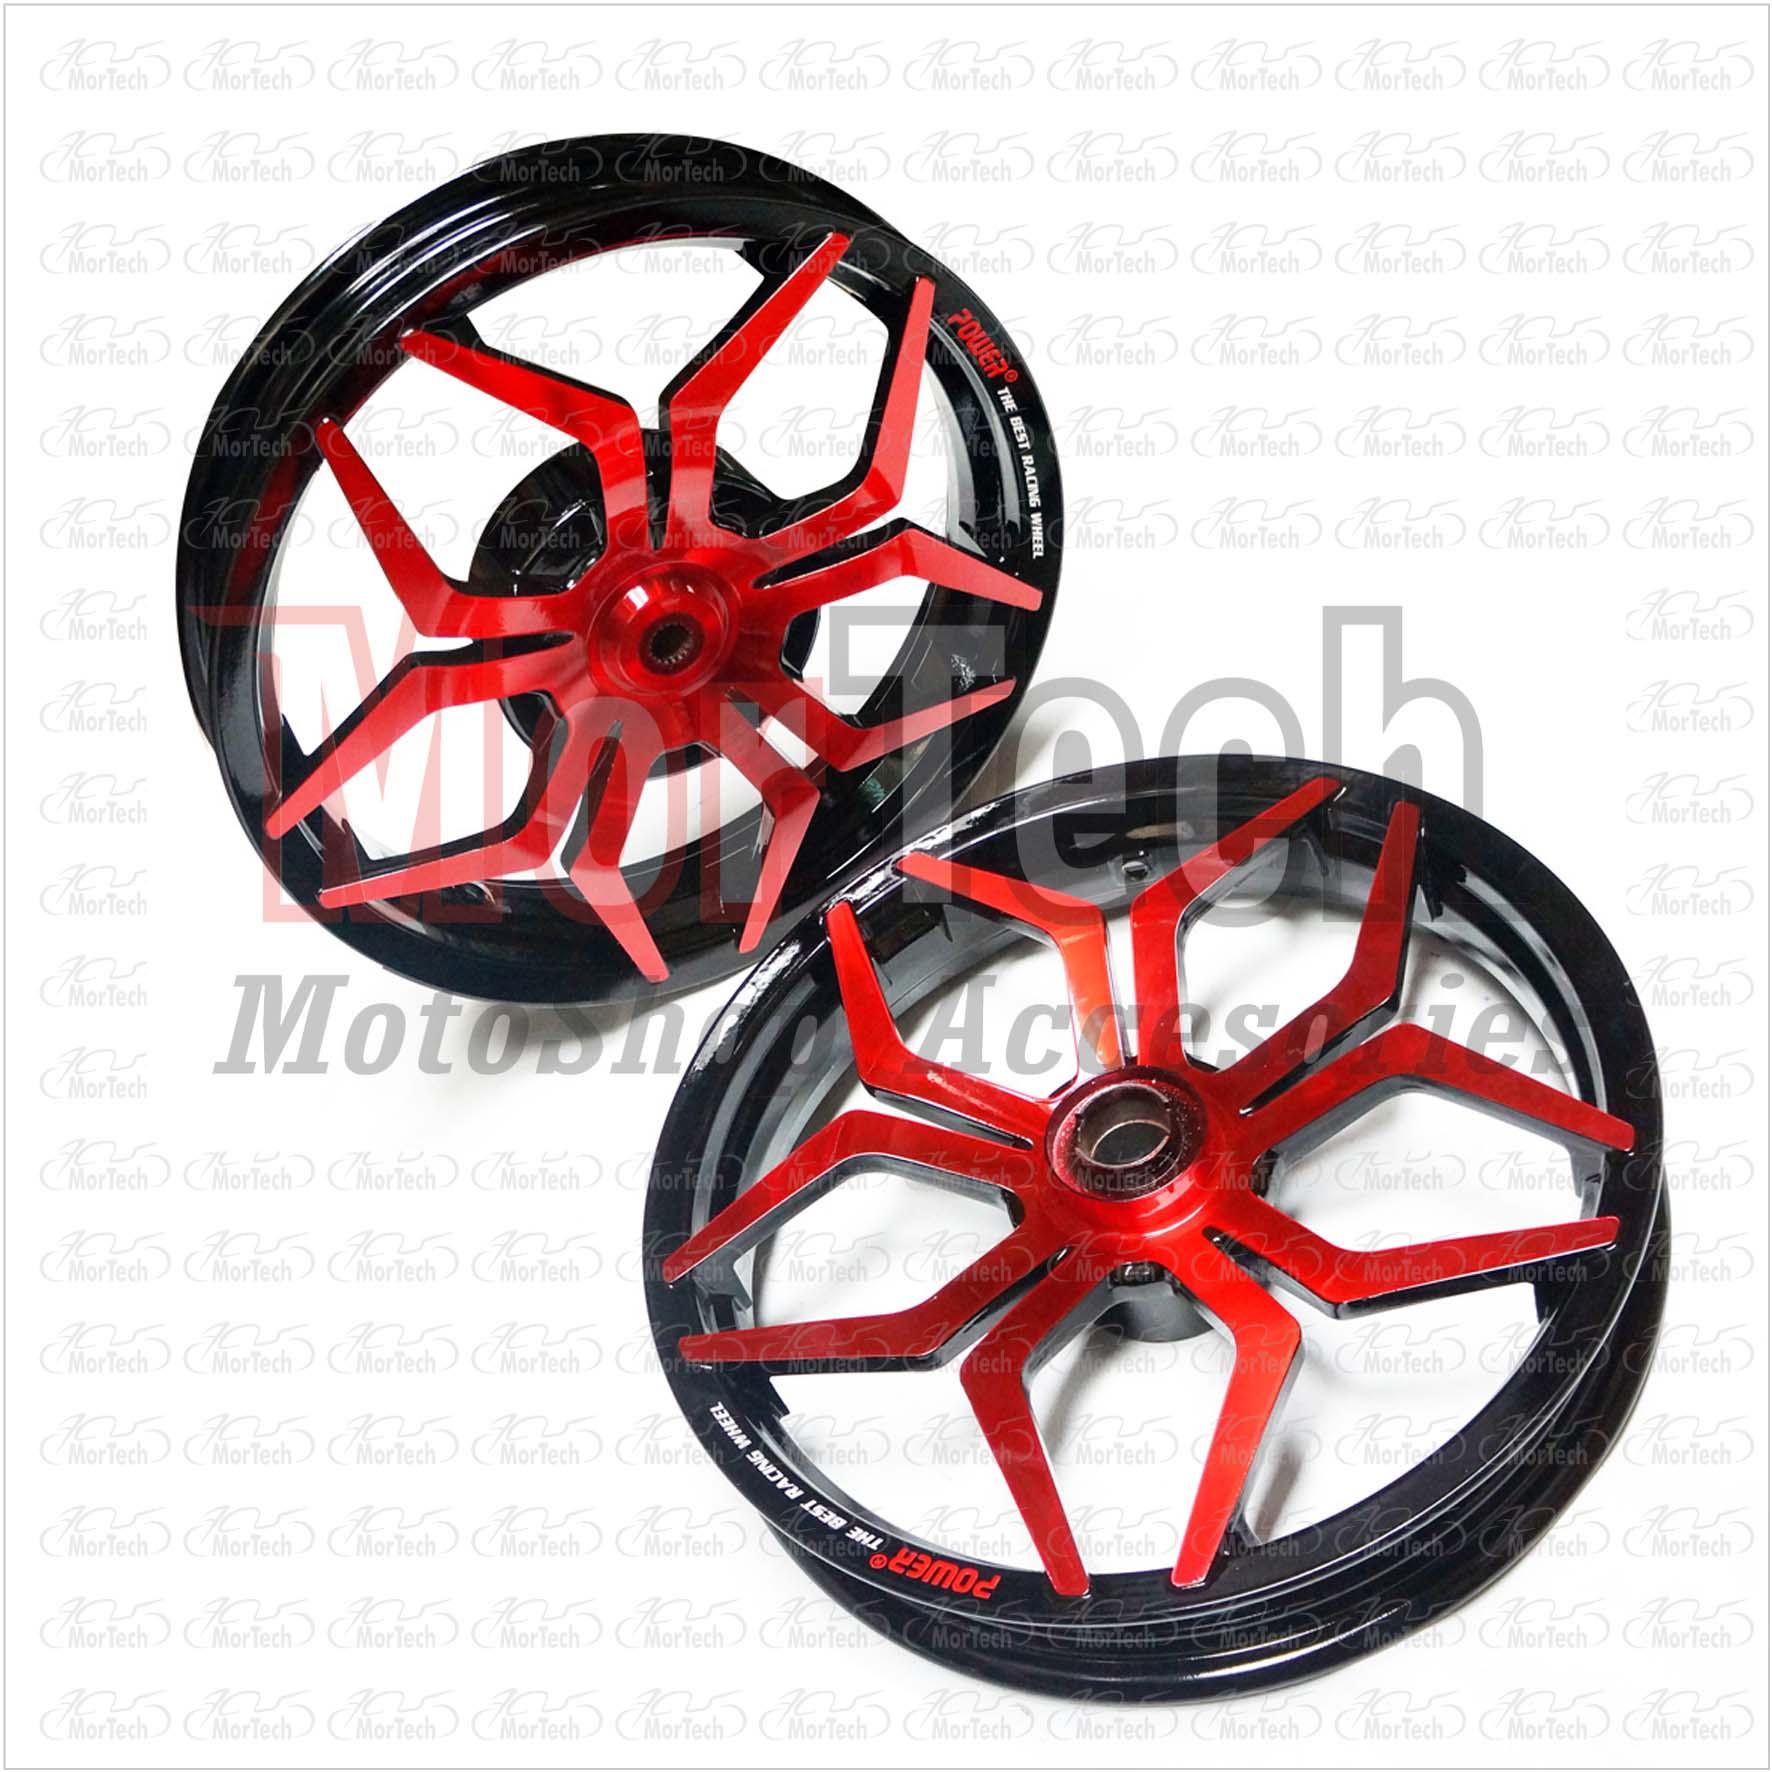 harga Velg Racing Lebar Power Spider Mio Smile Palang 5 Merah Hitam Tokopedia.com